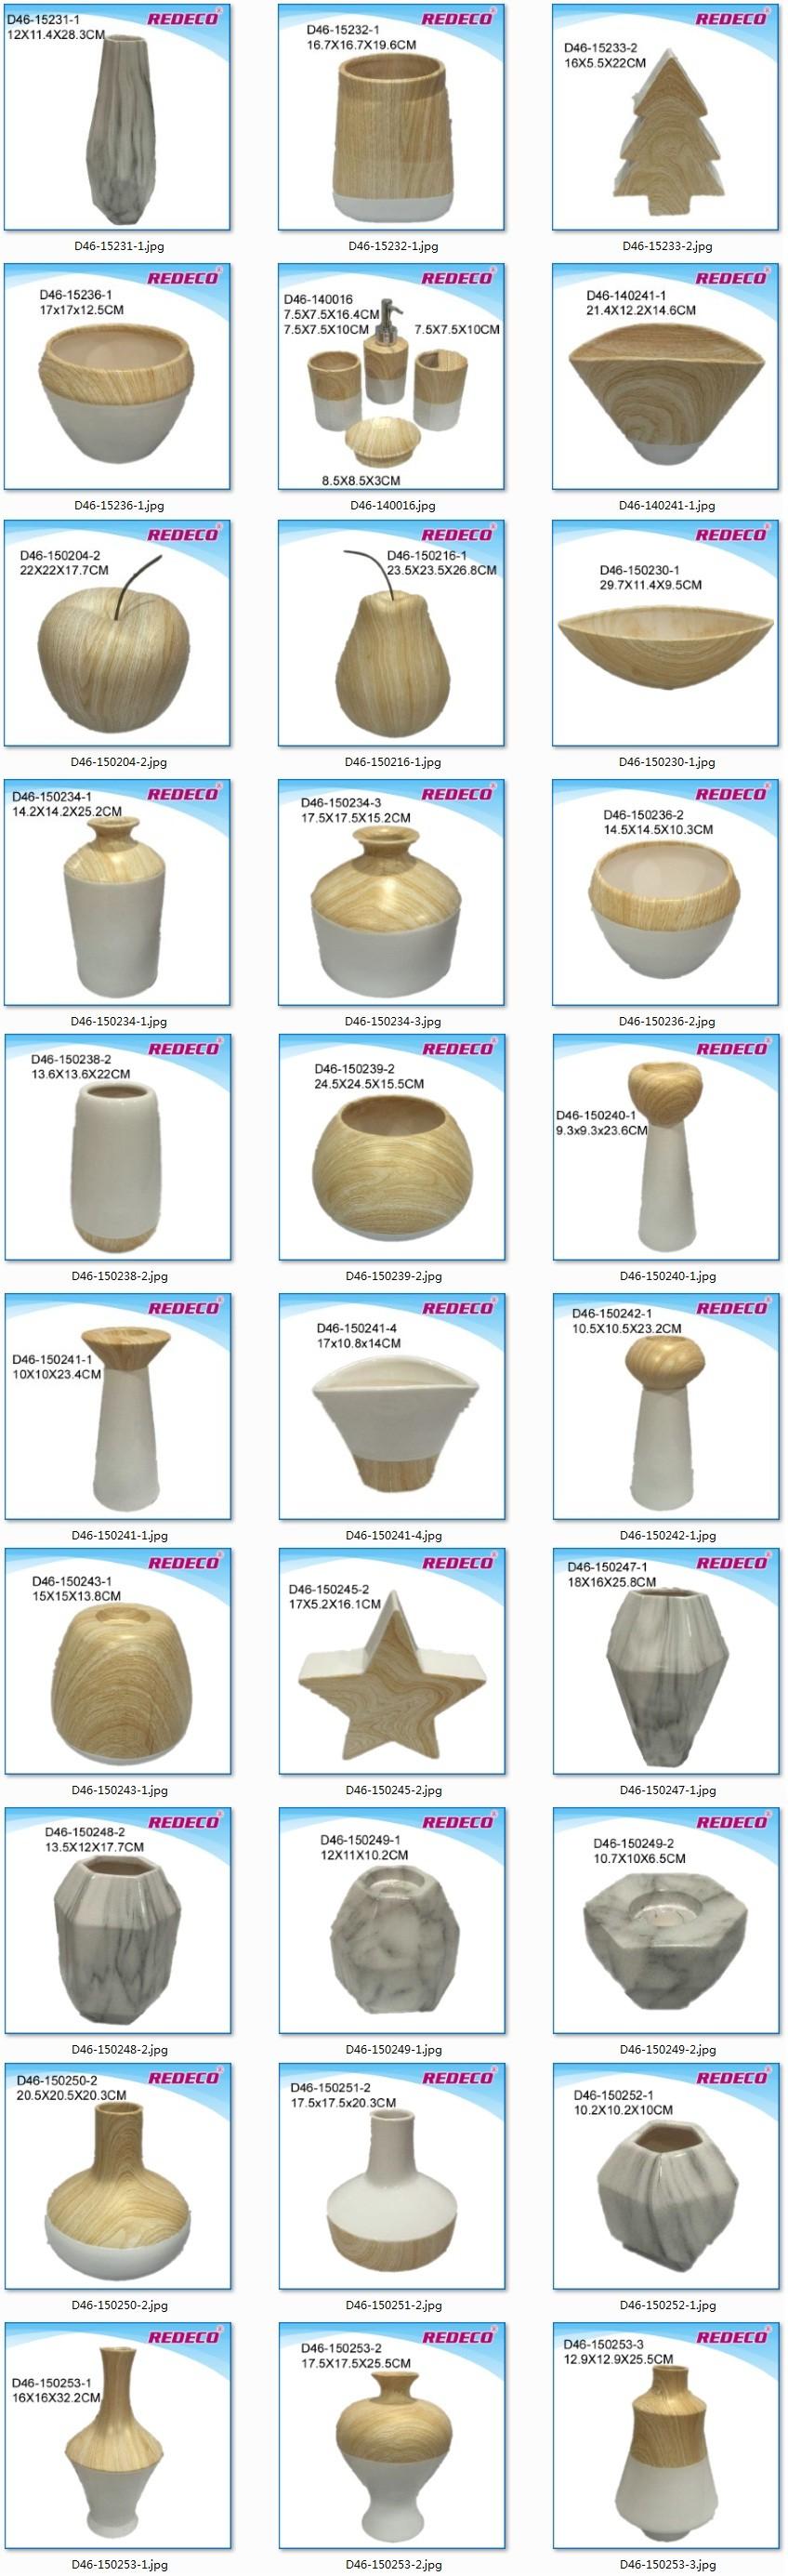 Wholesale Ceramic Wood Finish Decorative Bathroom Soap Dispenser